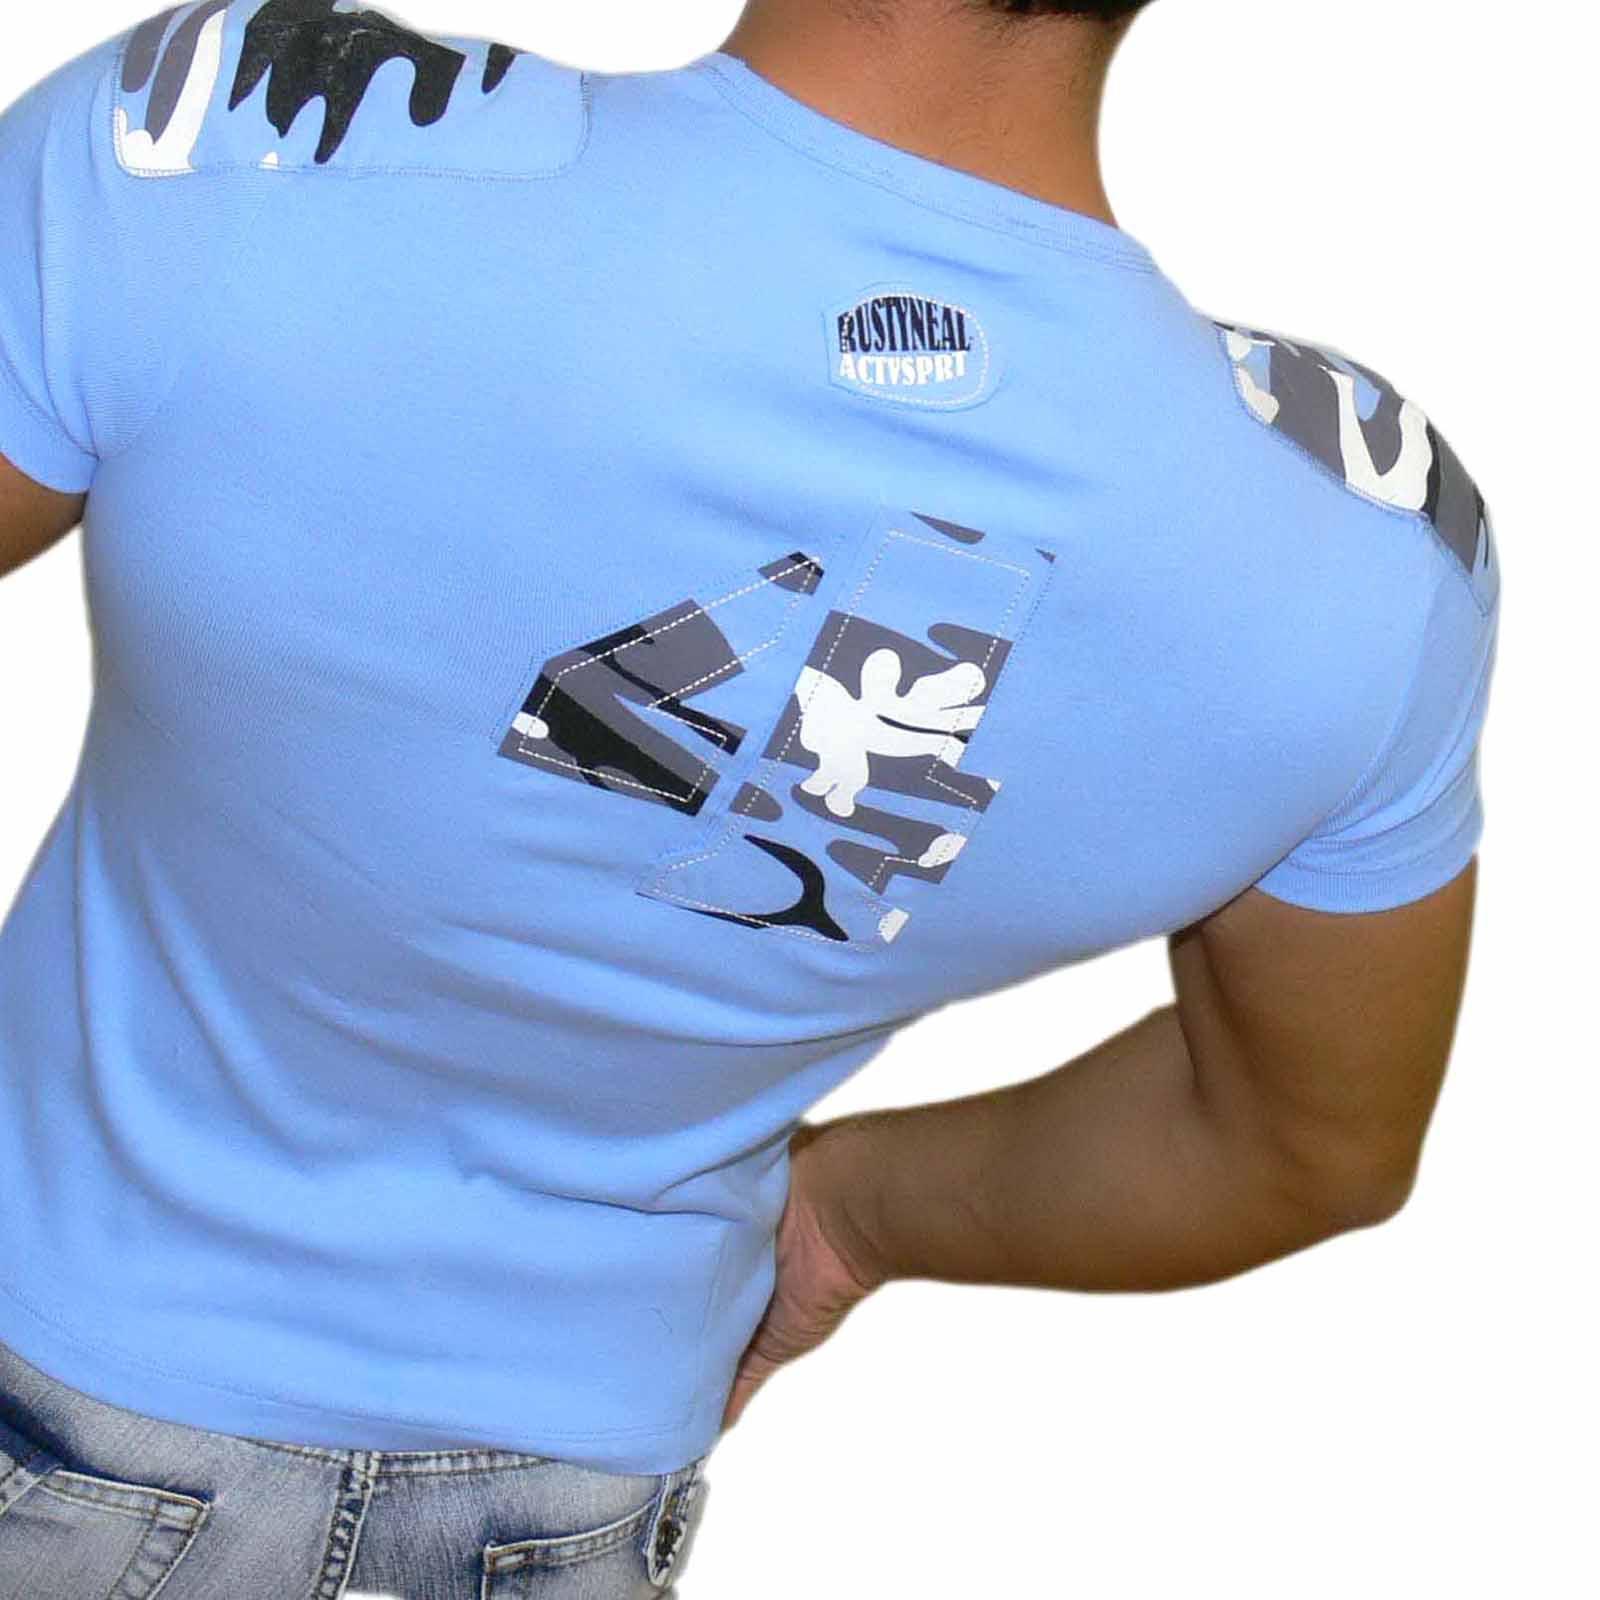 T-Shirt Blau 714 Rusty Neal